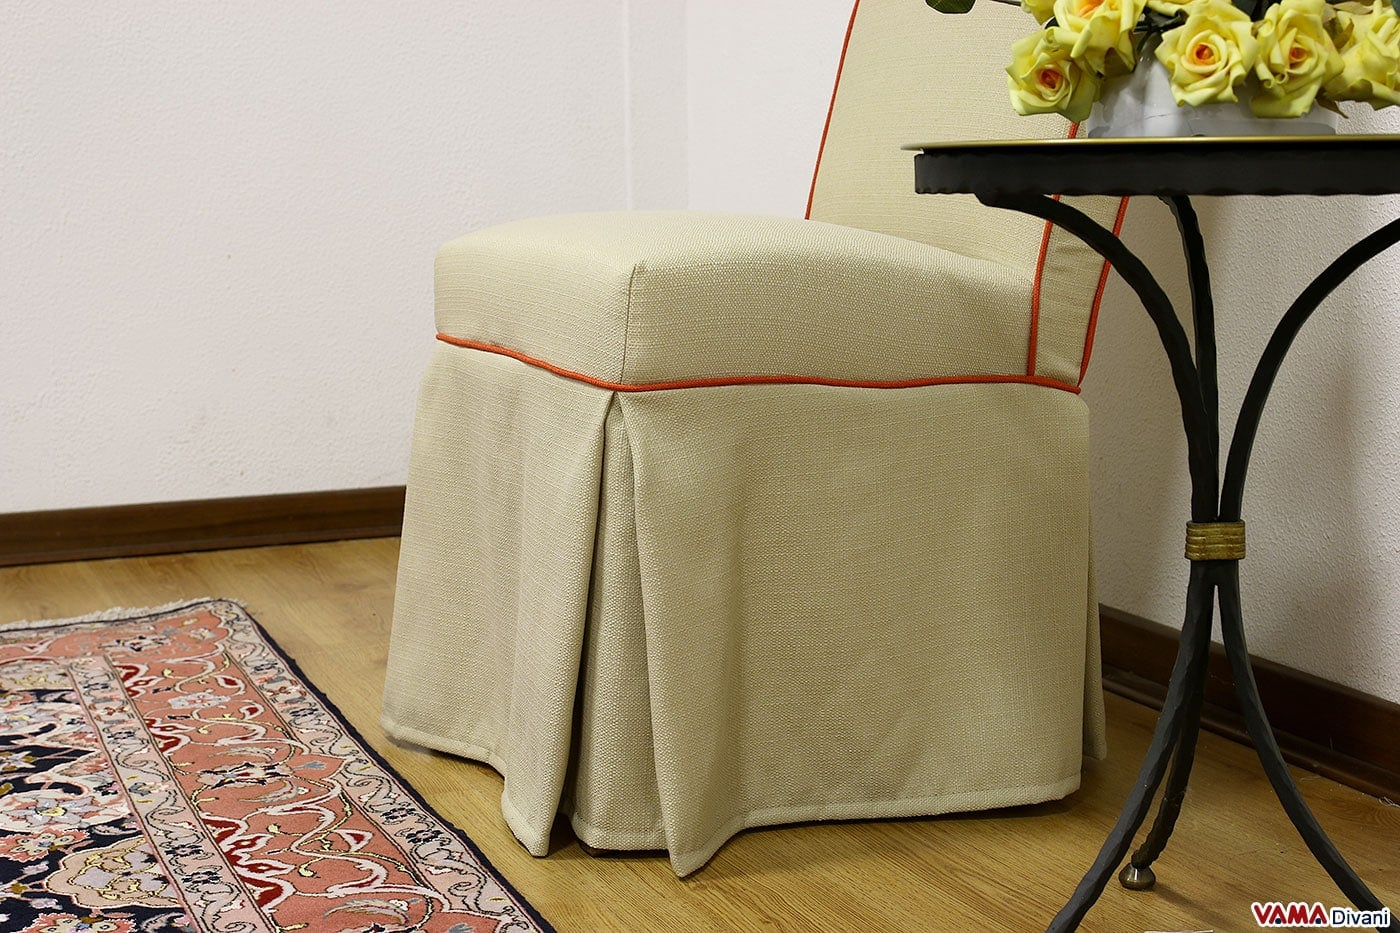 Sedia Imbottita Per Sala Da Pranzo In Tessuto Sfoderabile #A94122 1400 933 Sedia Imbottita Per Sala Da Pranzo